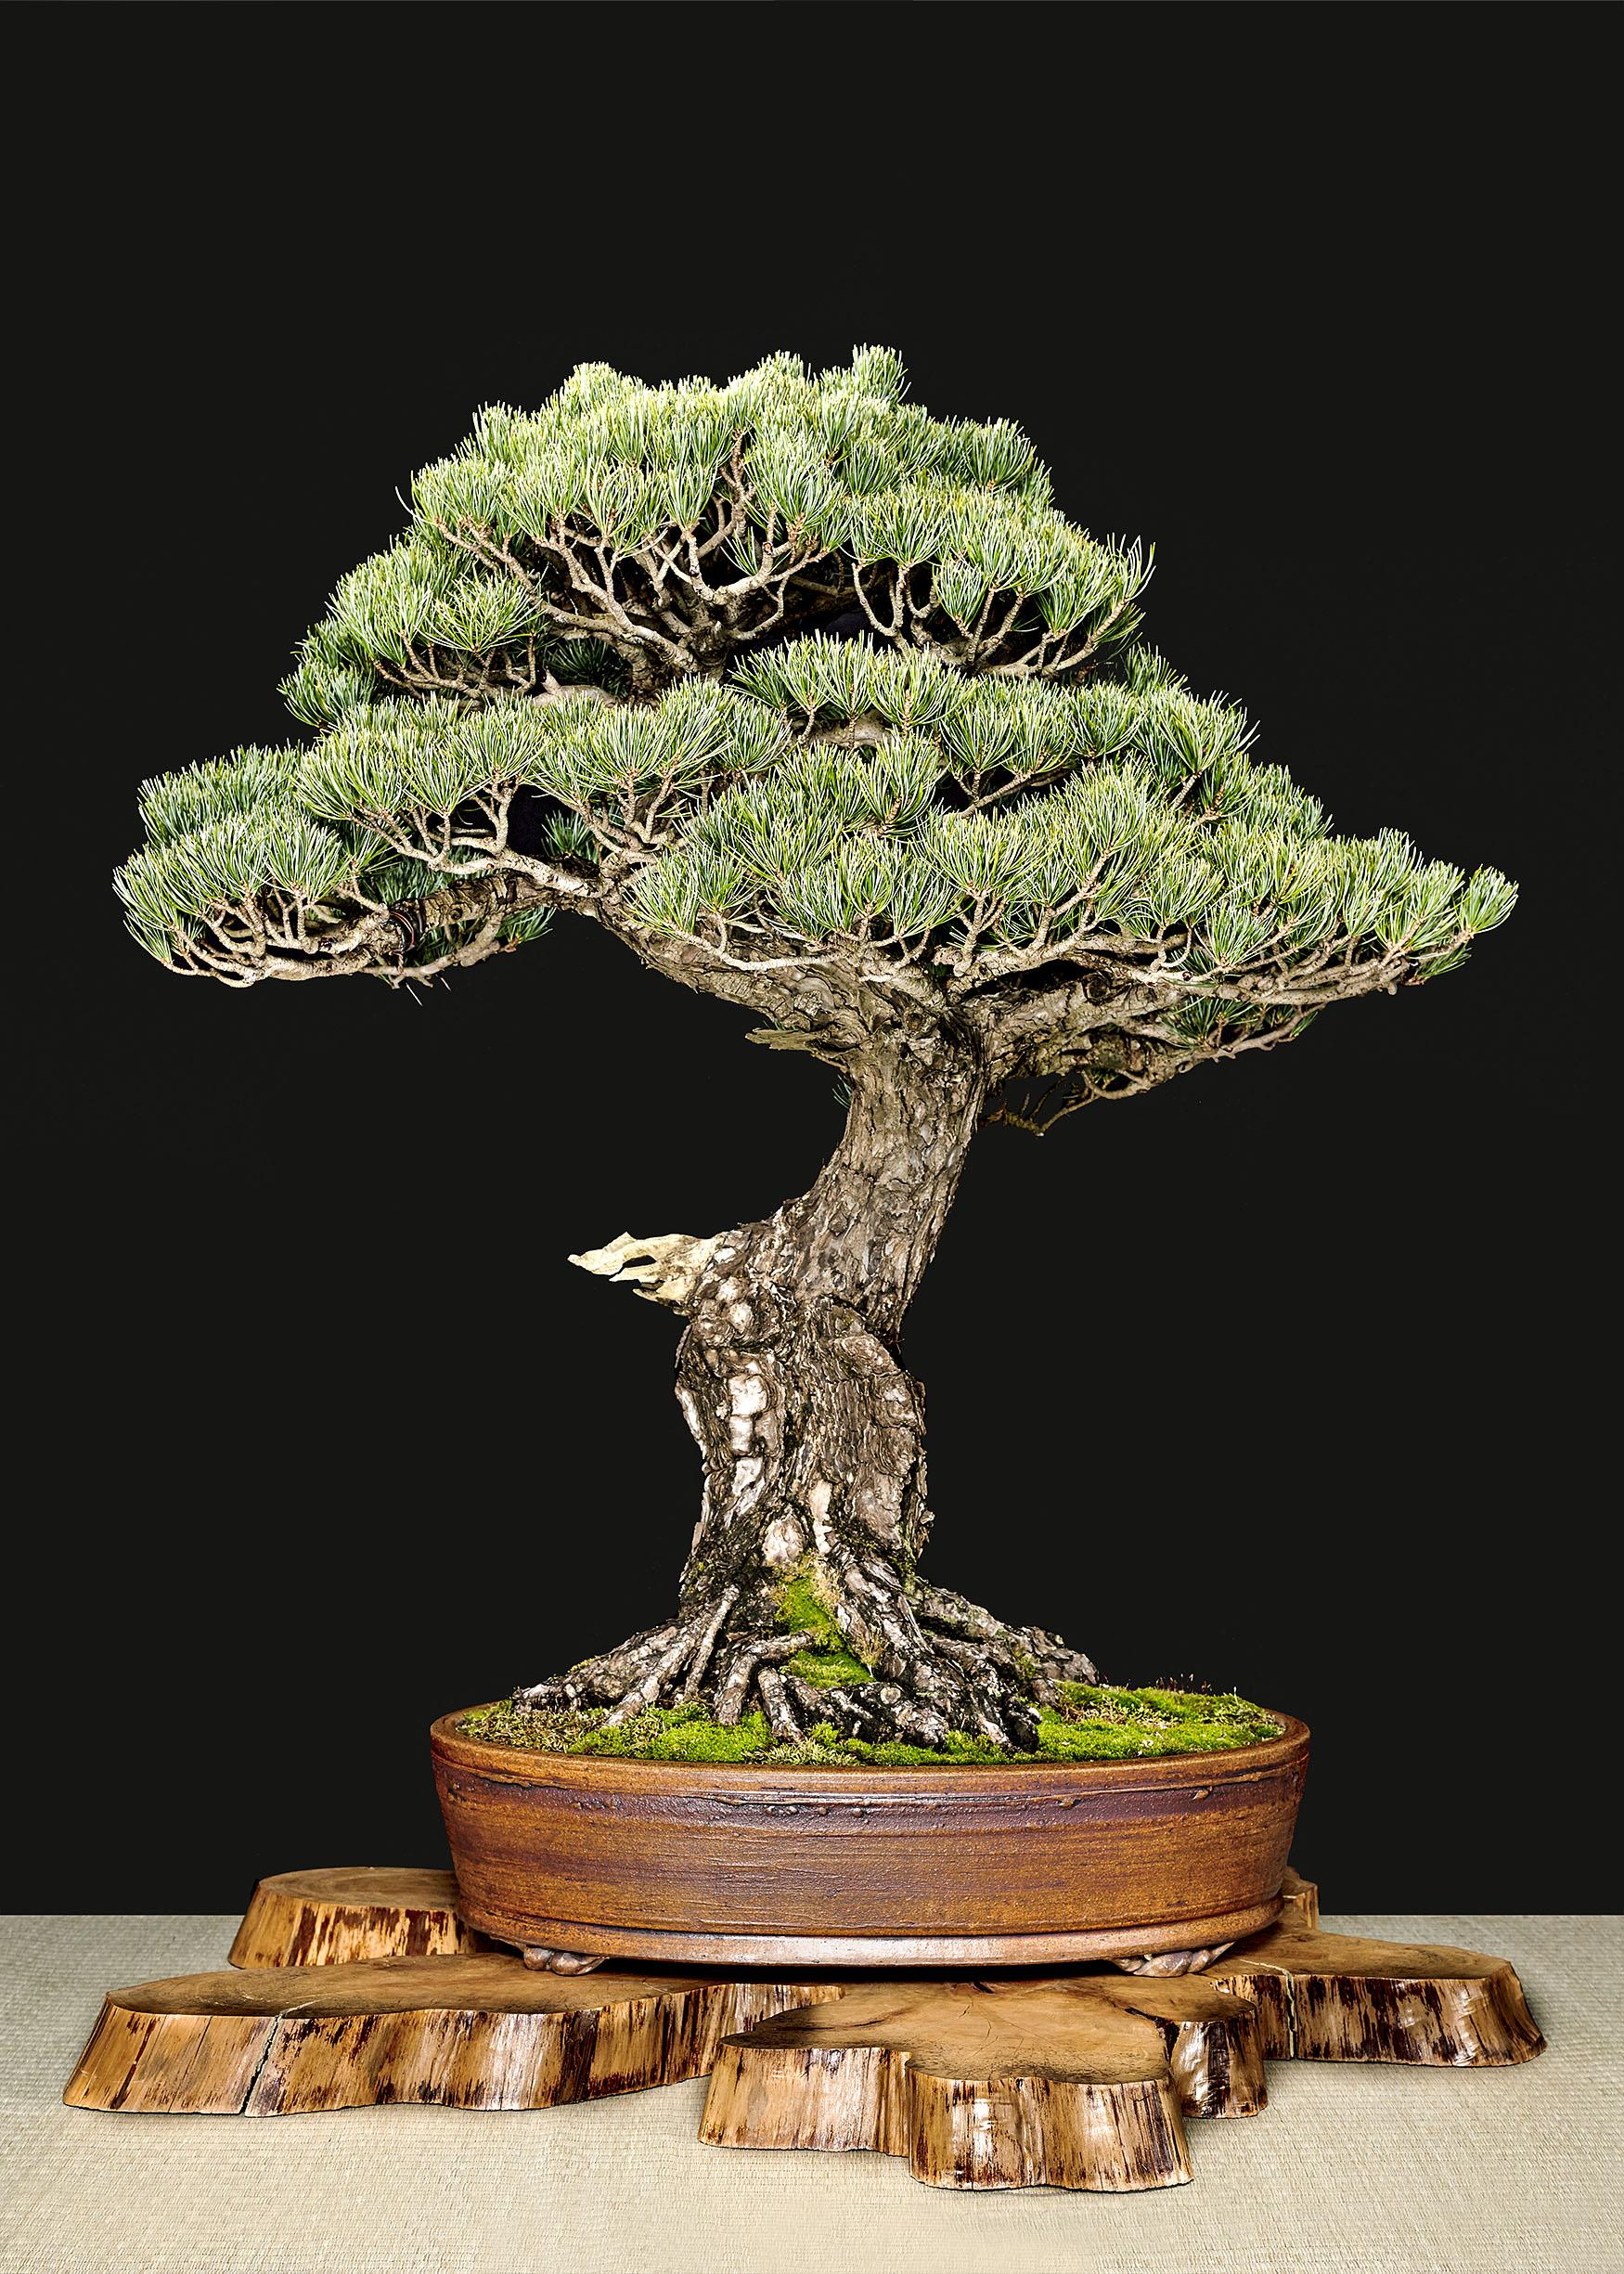 Japanese Black Pine: Pinus thunbergii | Bonsai Learning Center